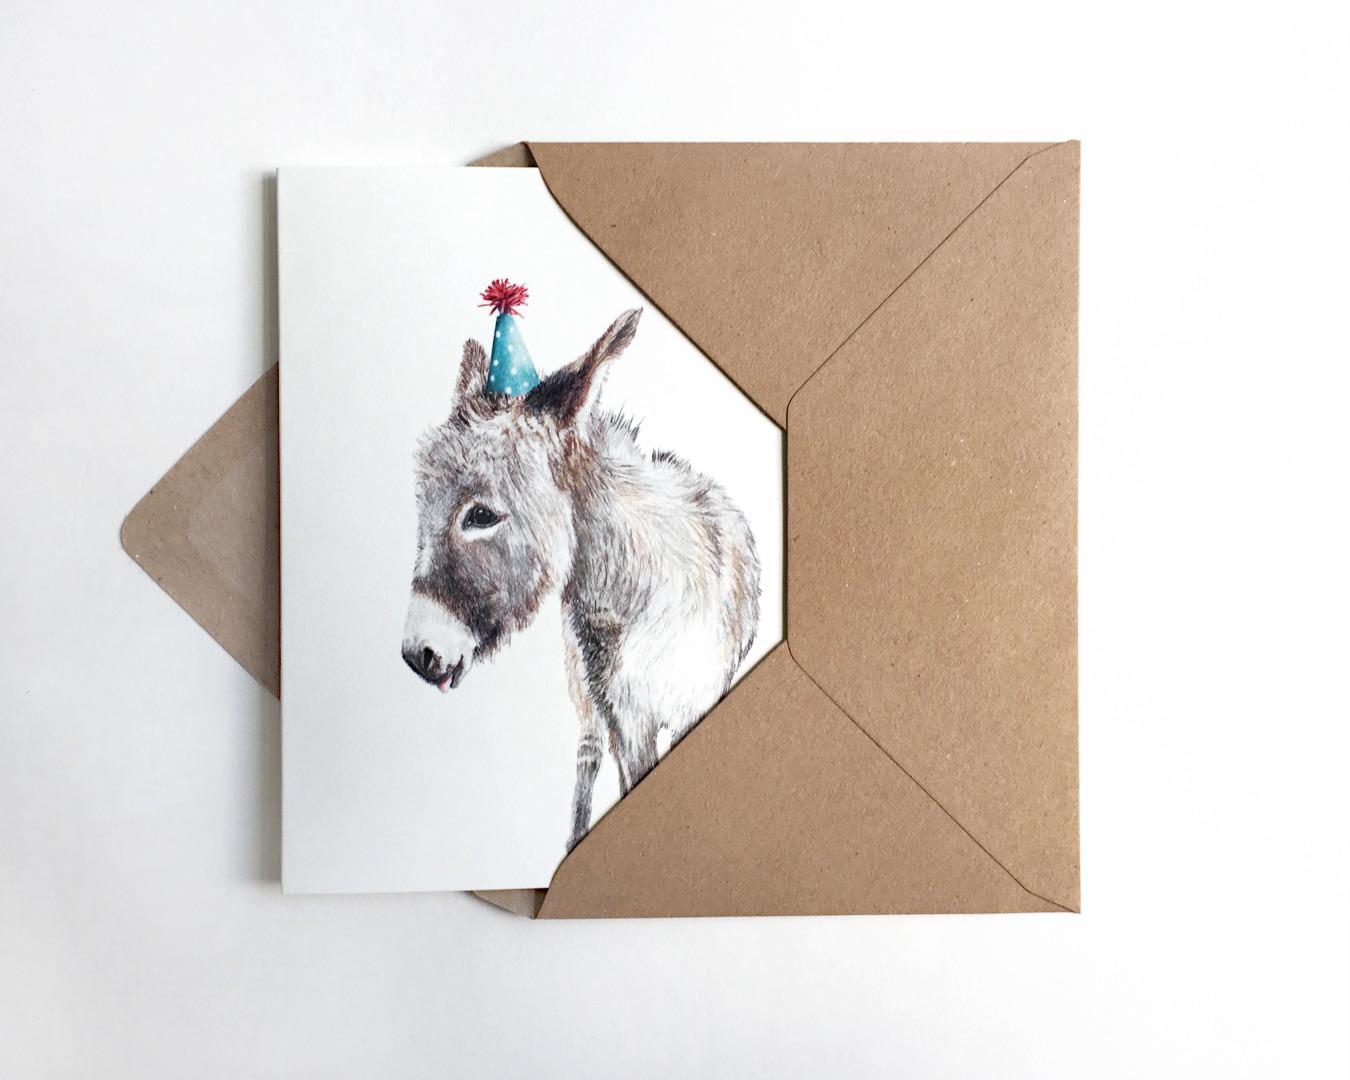 PARTYESEL-Grusskarte-Geburtstagskarte-Poster-Kunstdruck-A6